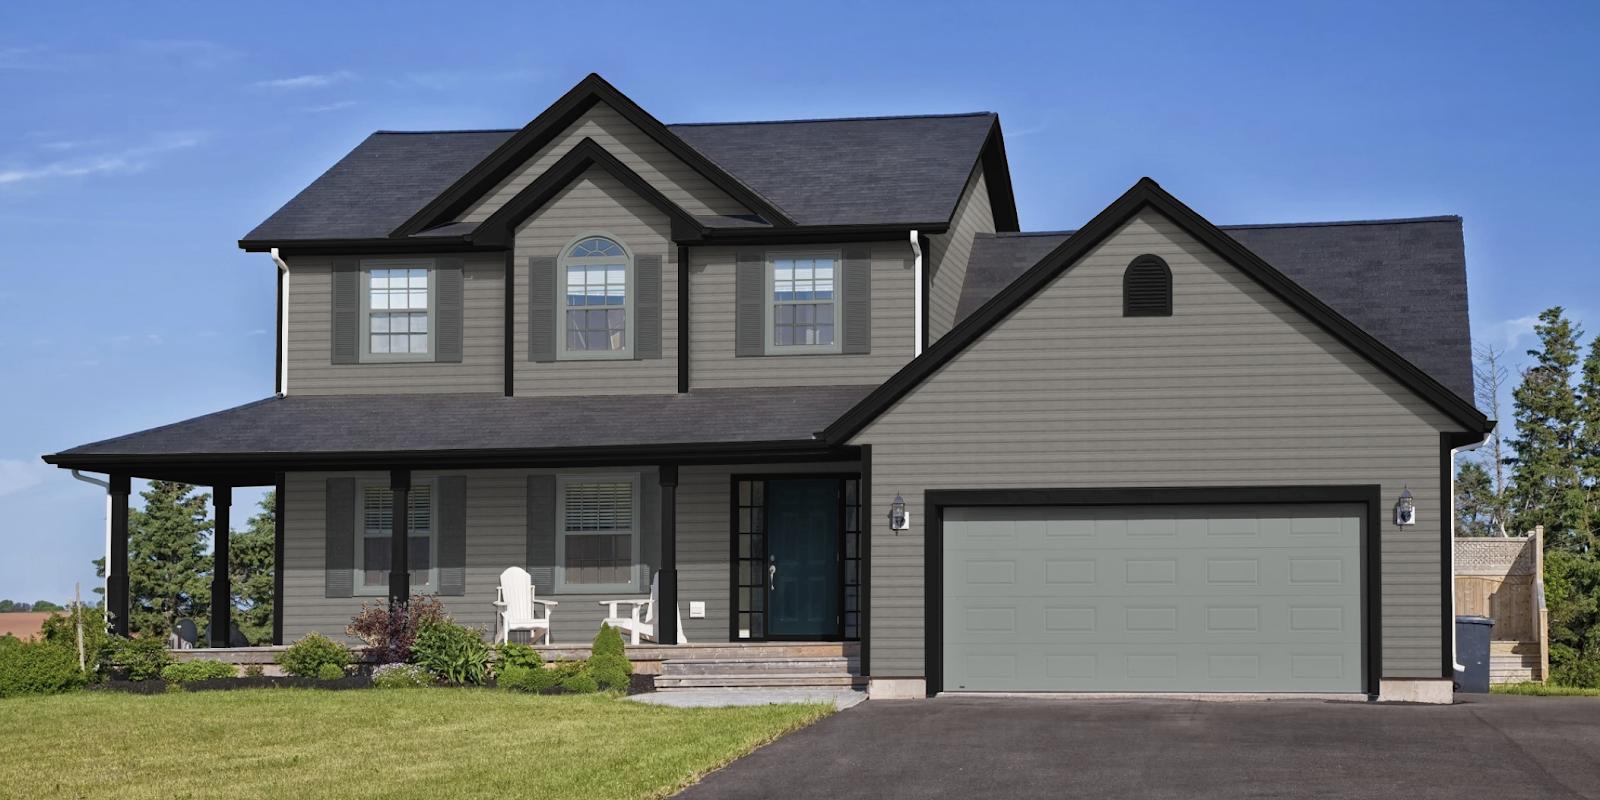 Unexpected color trim combinations design ideas allura cms - Exterior house colors with black trim ...